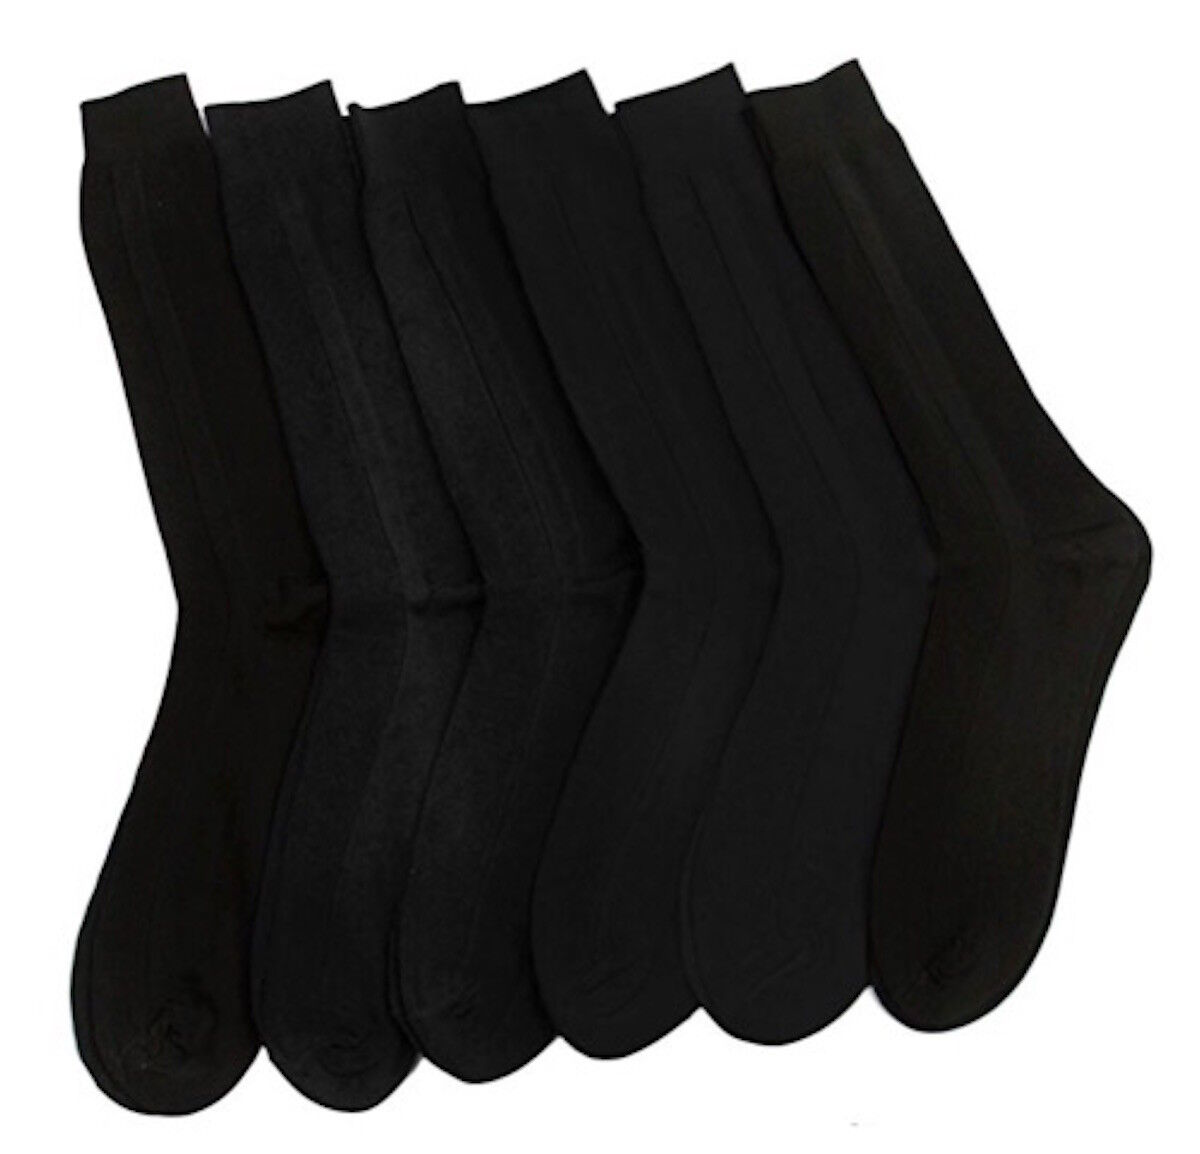 1 6 12 24 Pairs Men BLACK Ribbed Crew Dress Socks 100% Ribbe